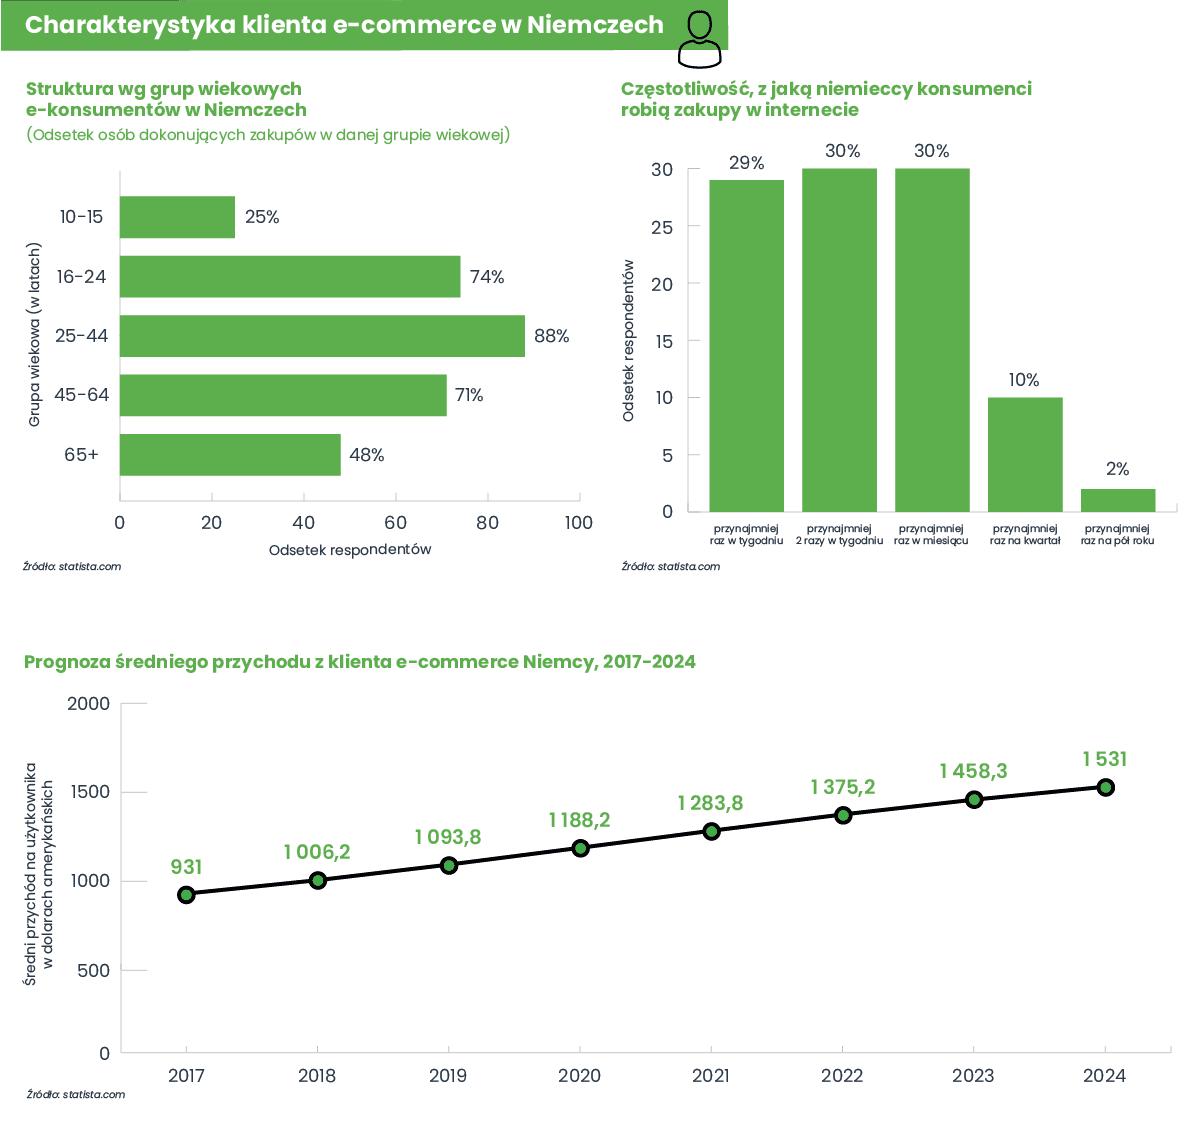 Charakterystyka klienta e-commerce w Niemczech